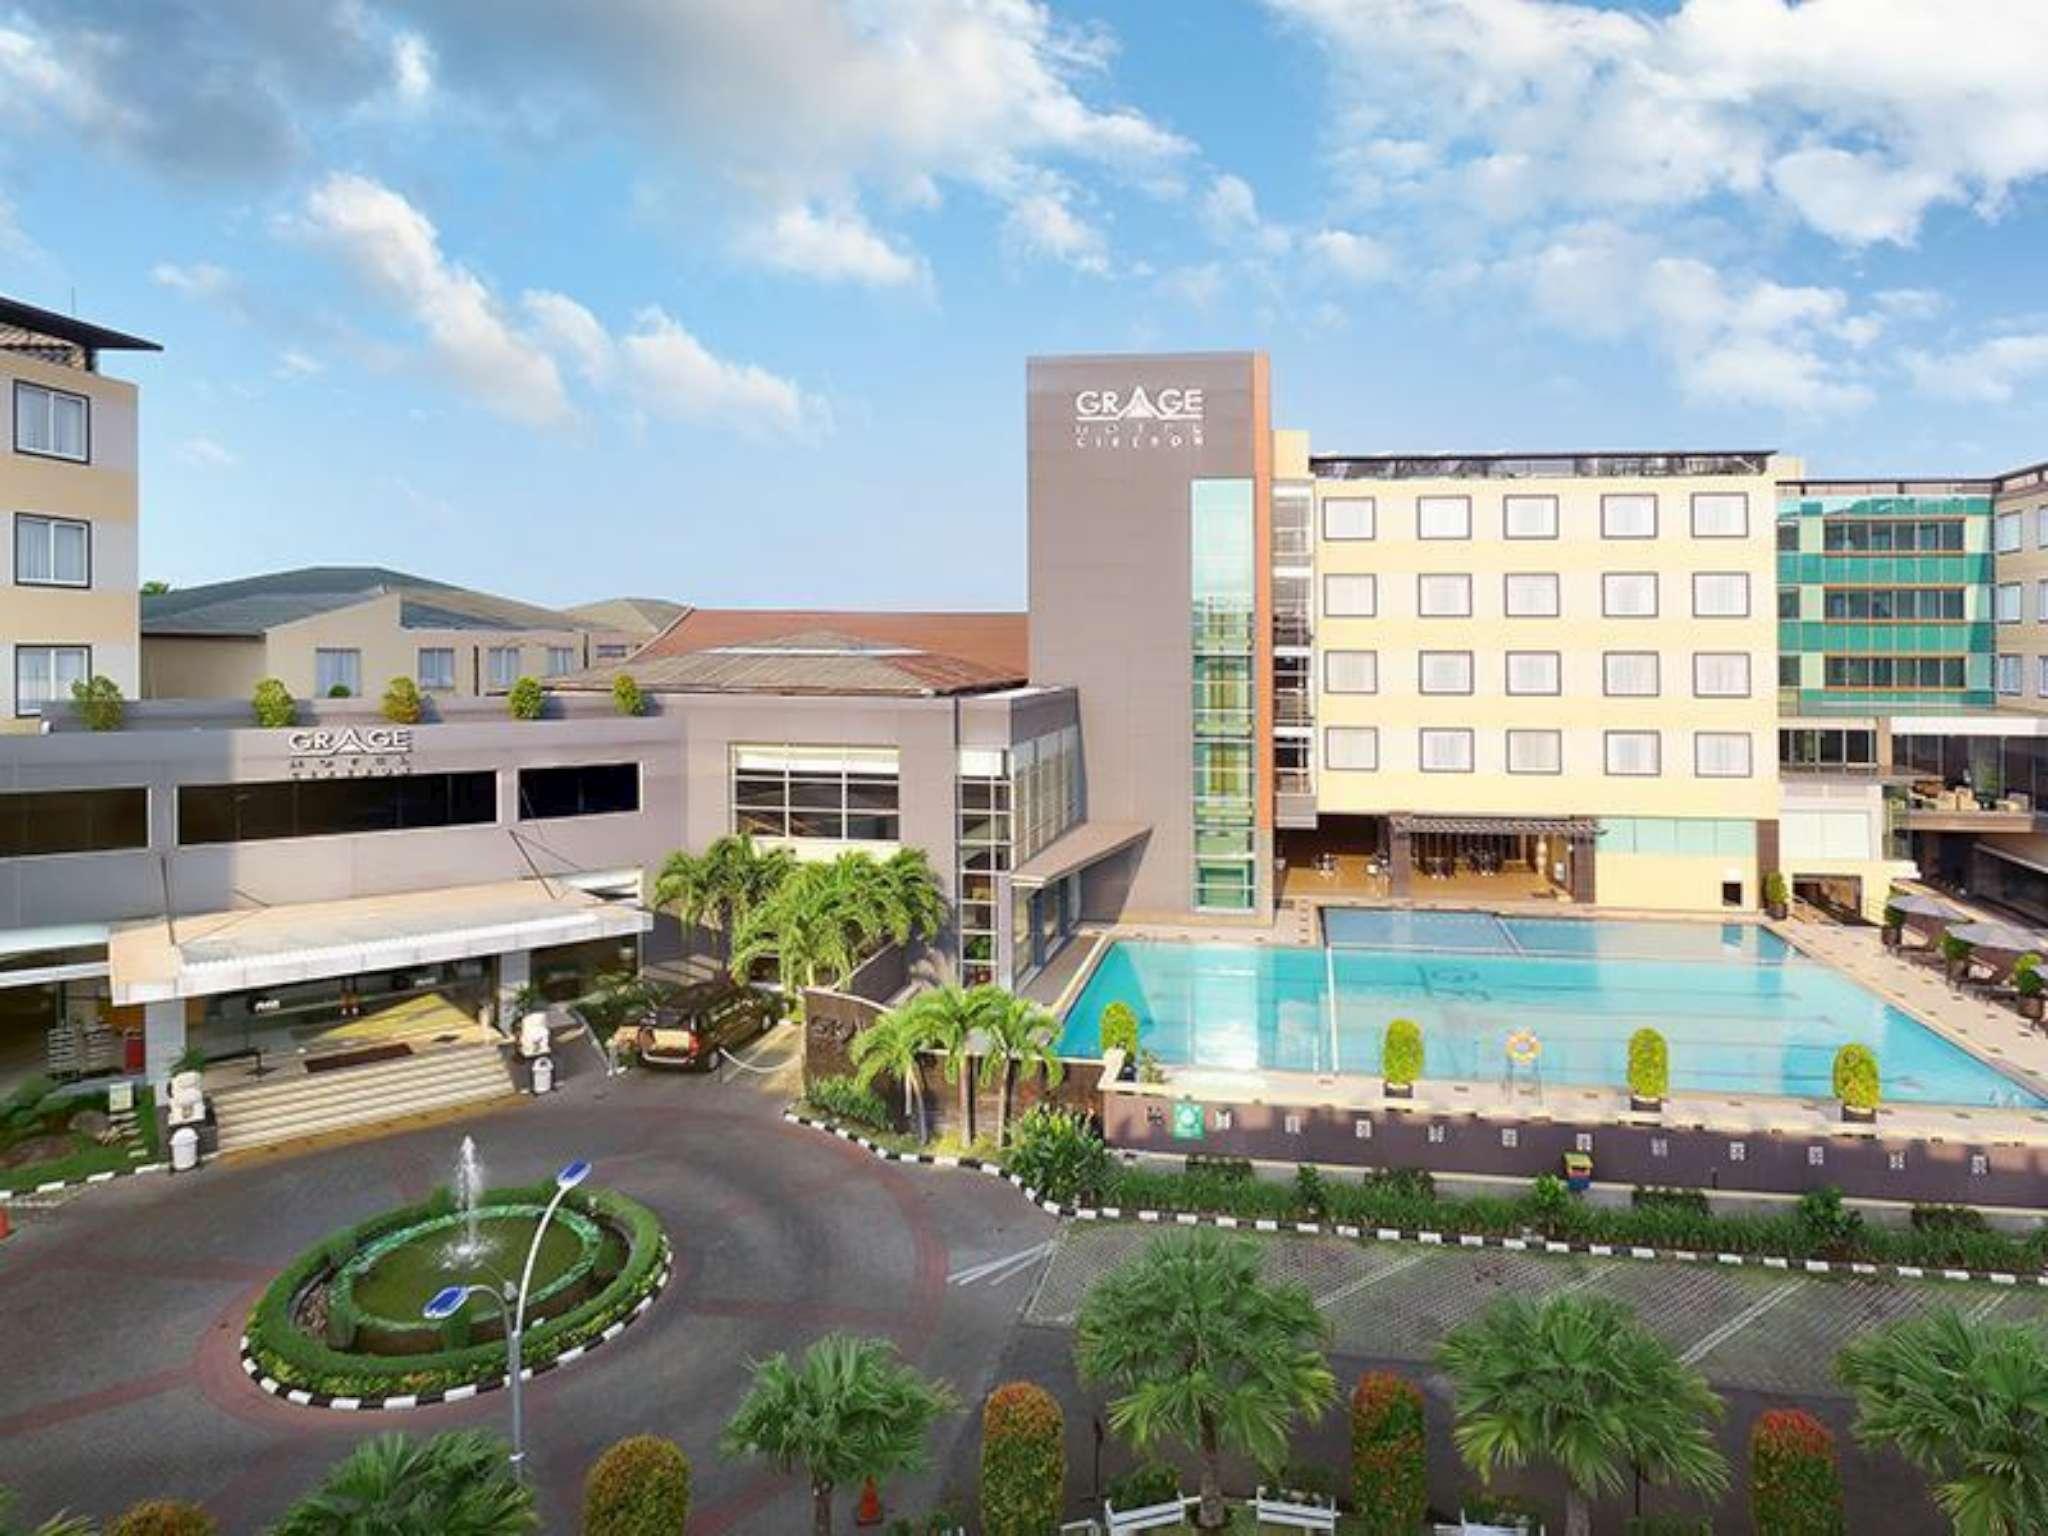 10 best cirebon hotels hd photos reviews of hotels in cirebon rh agoda com